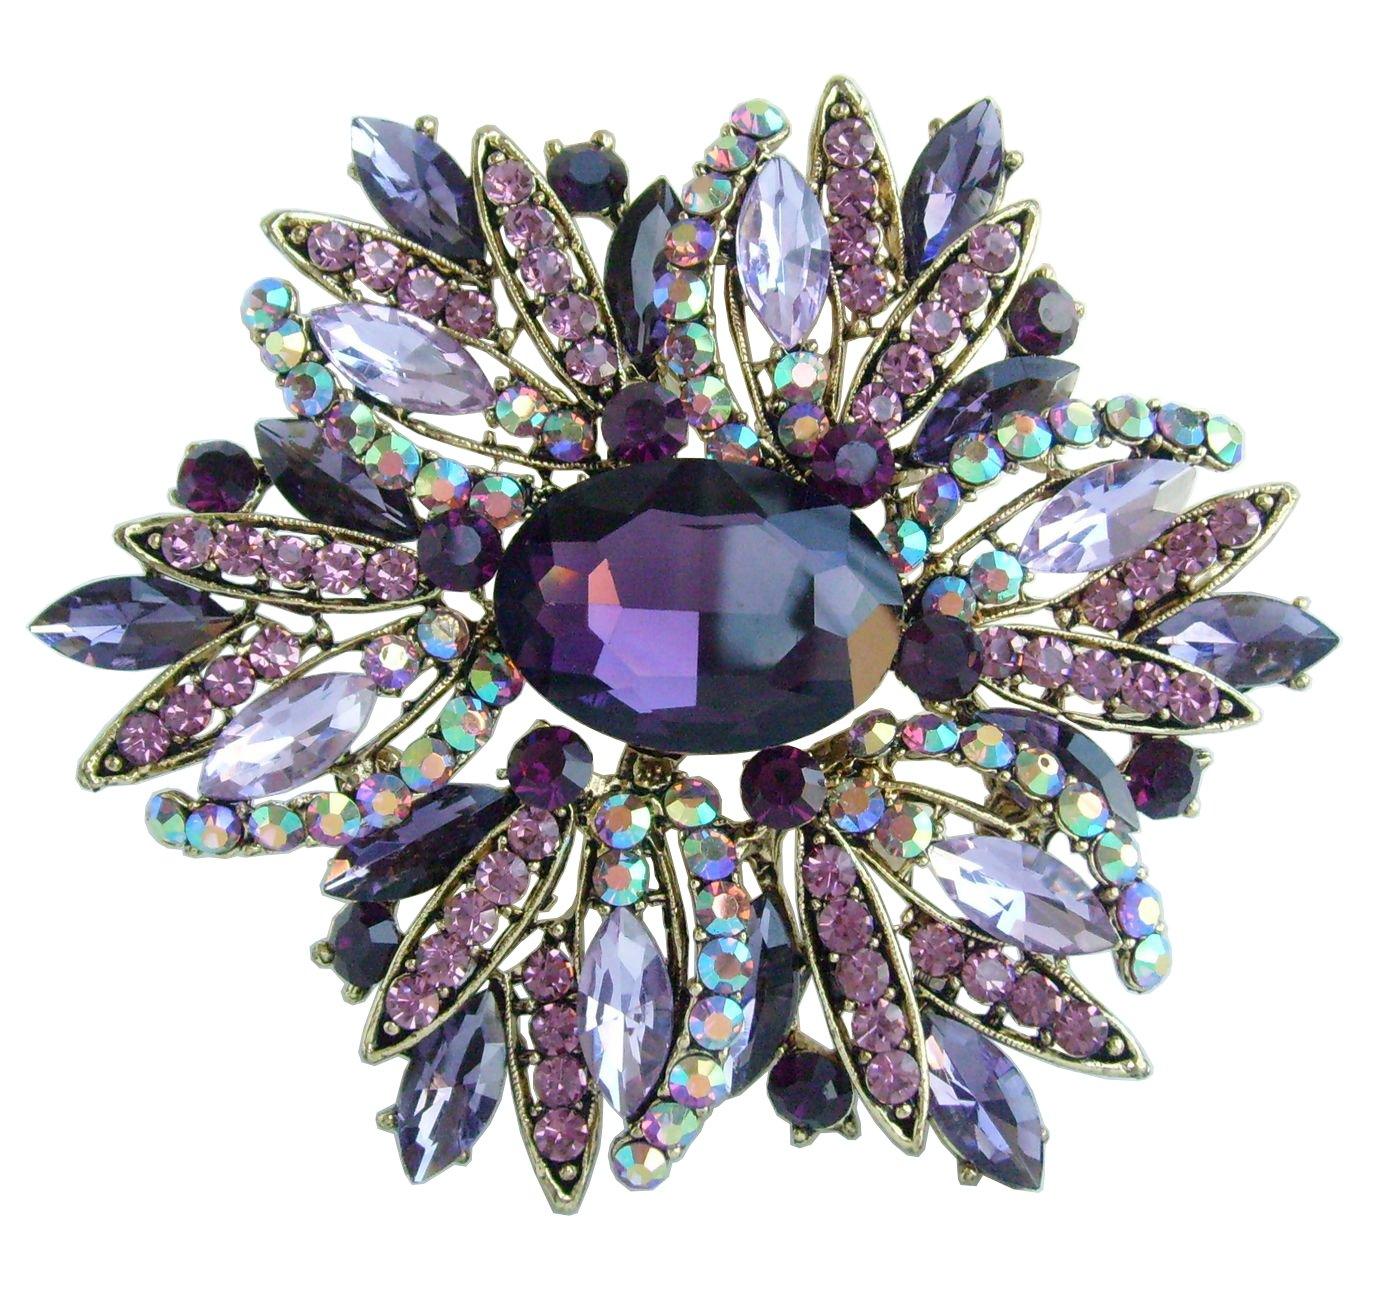 Sindary 3.94'' Purple Rhinestone Crystal Teardrop Flower Brooch Pin Pendant BZ4053